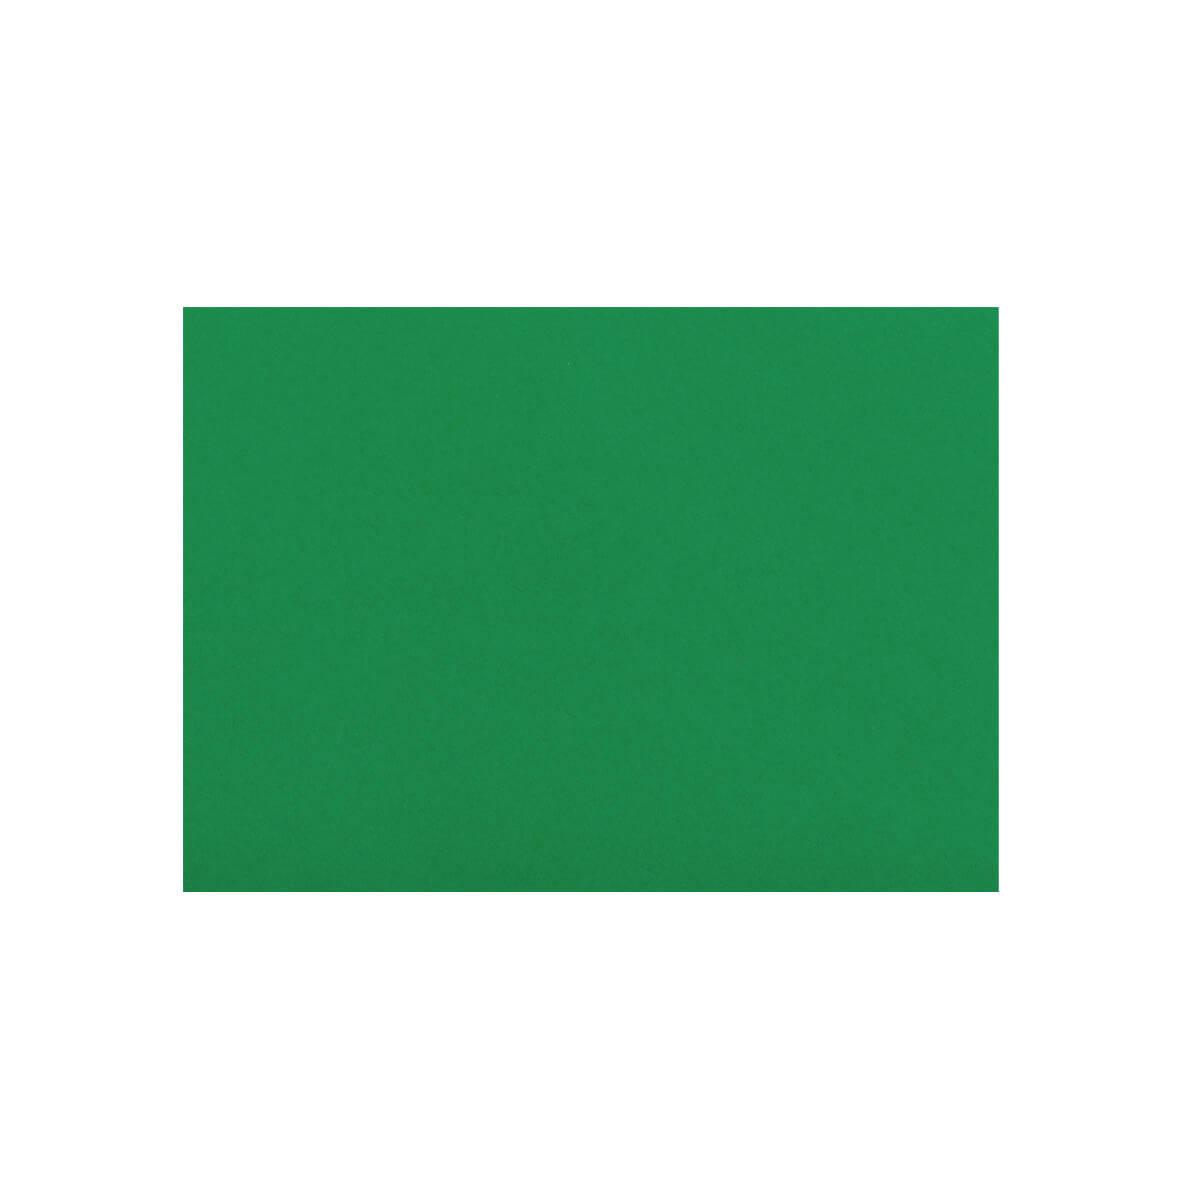 C7 DARK GREEN ENVELOPES 120GSM